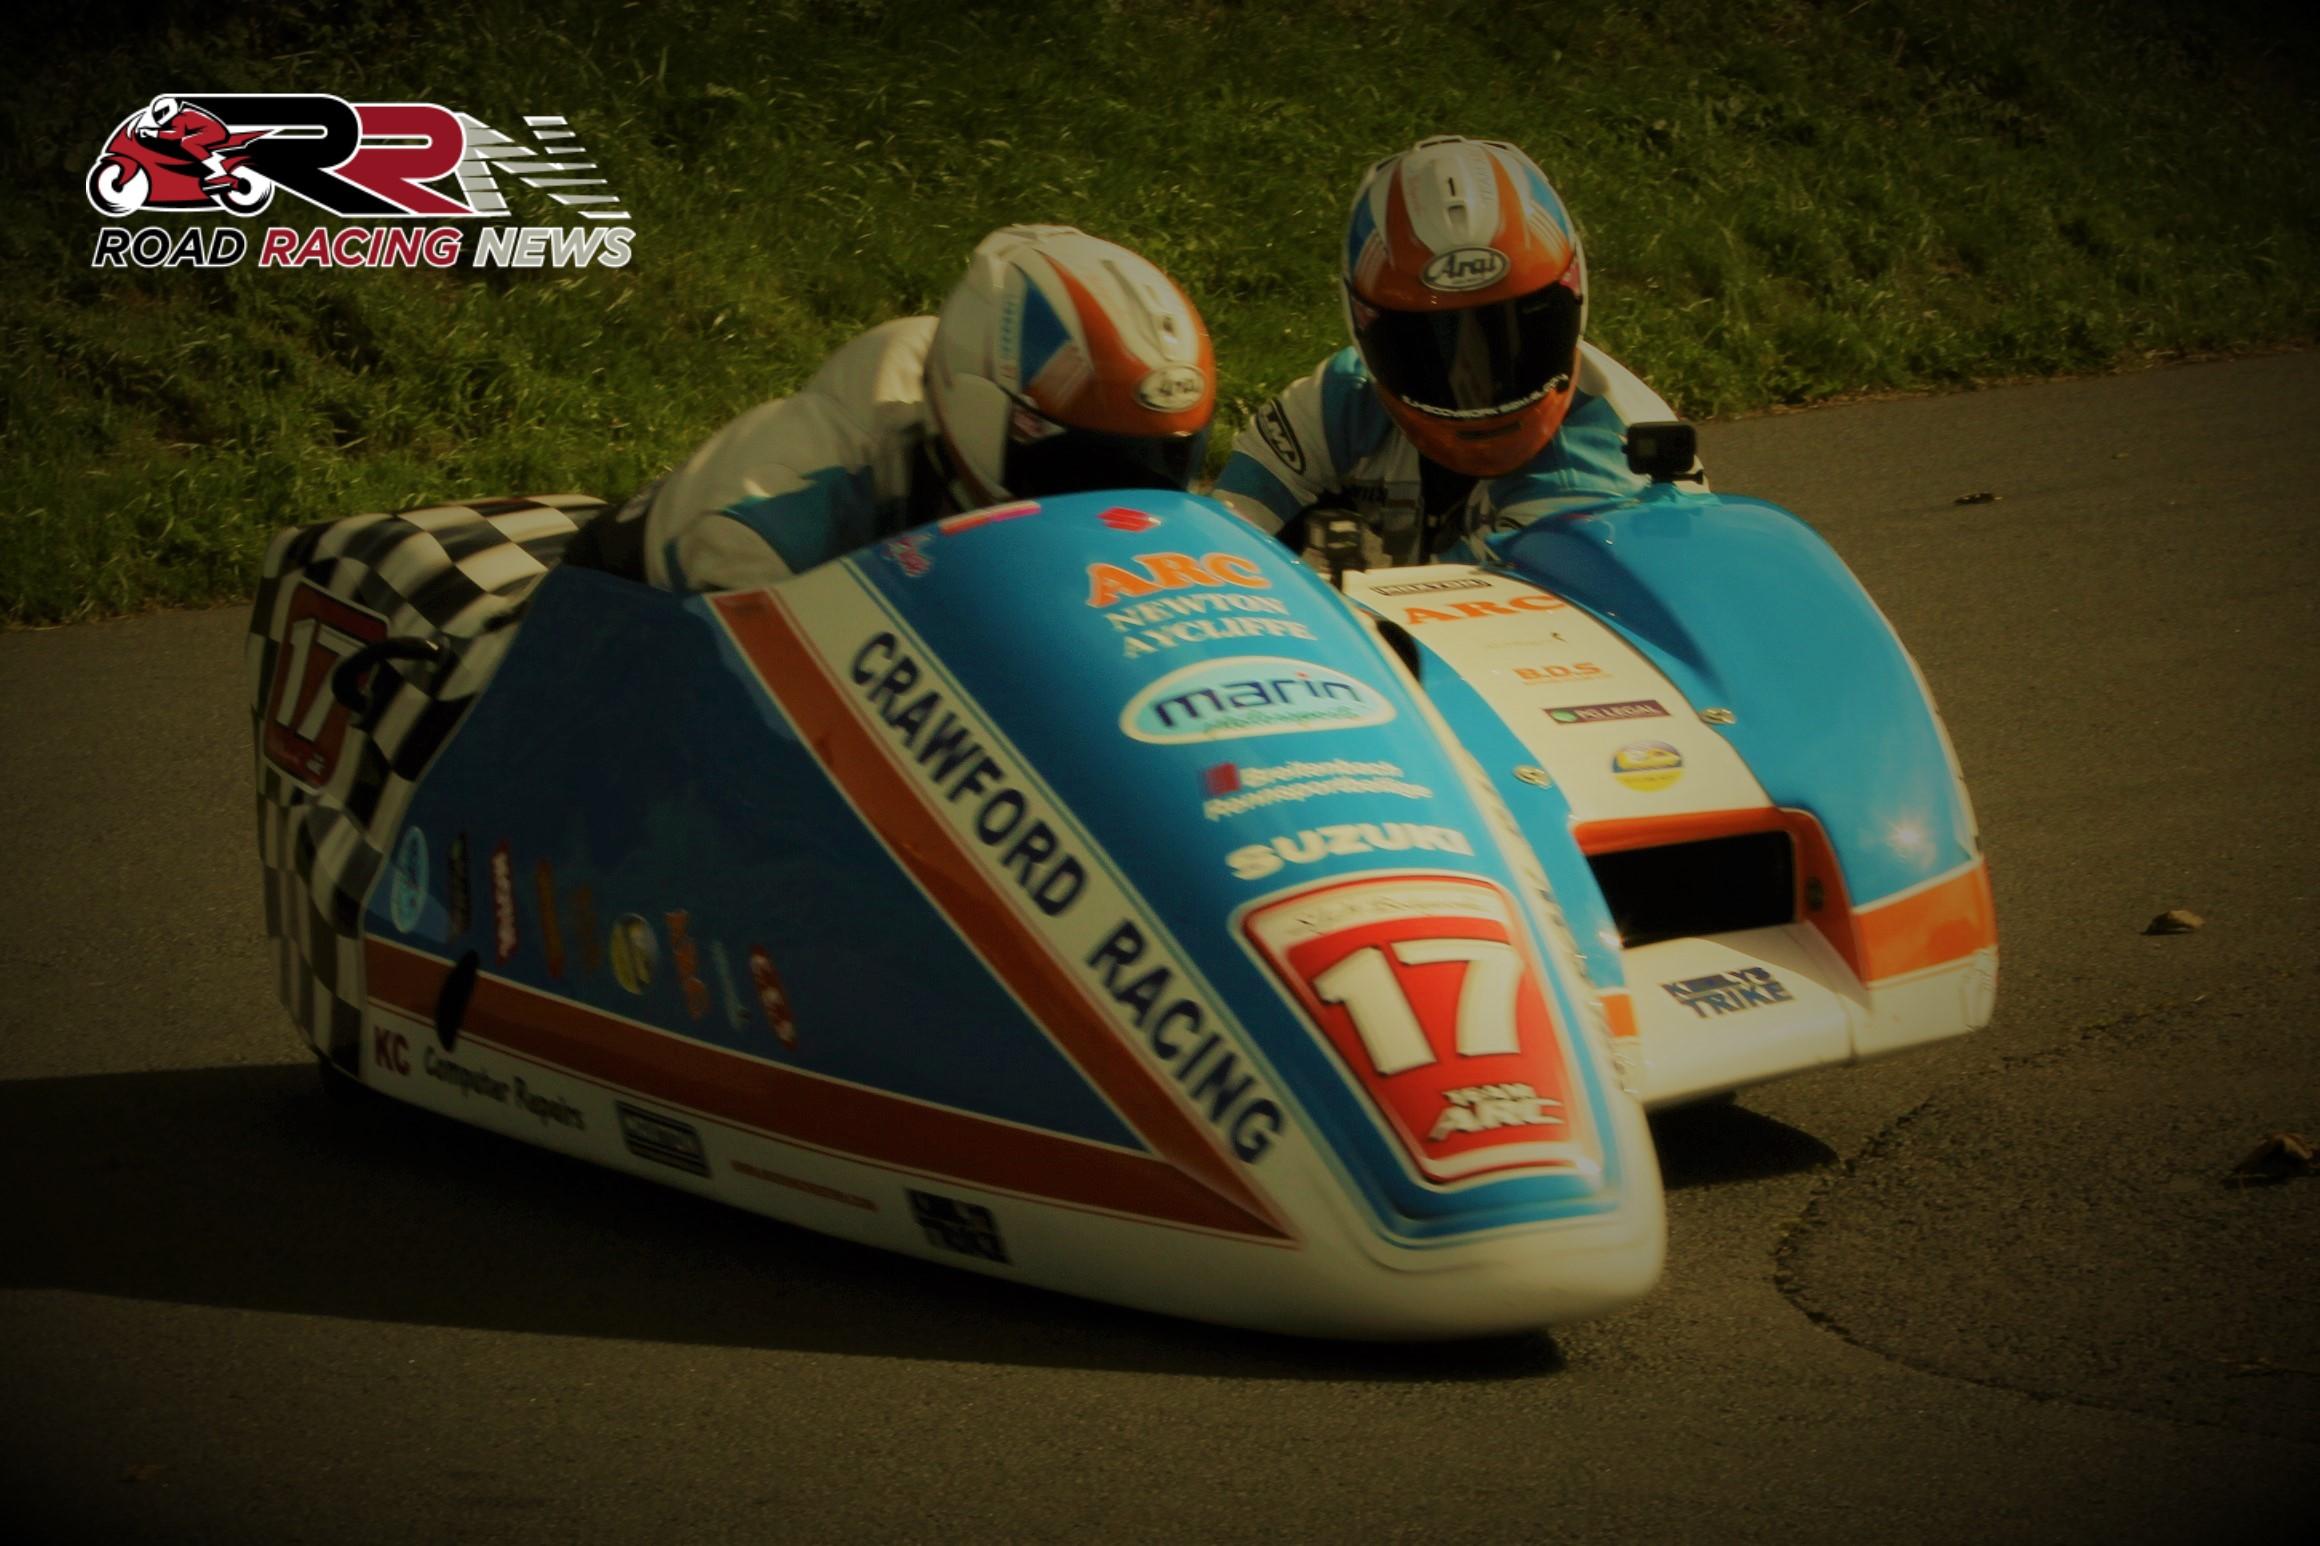 Road Racer's Adventures: British F2 Sidecar Championship, Brands Hatch Day 1